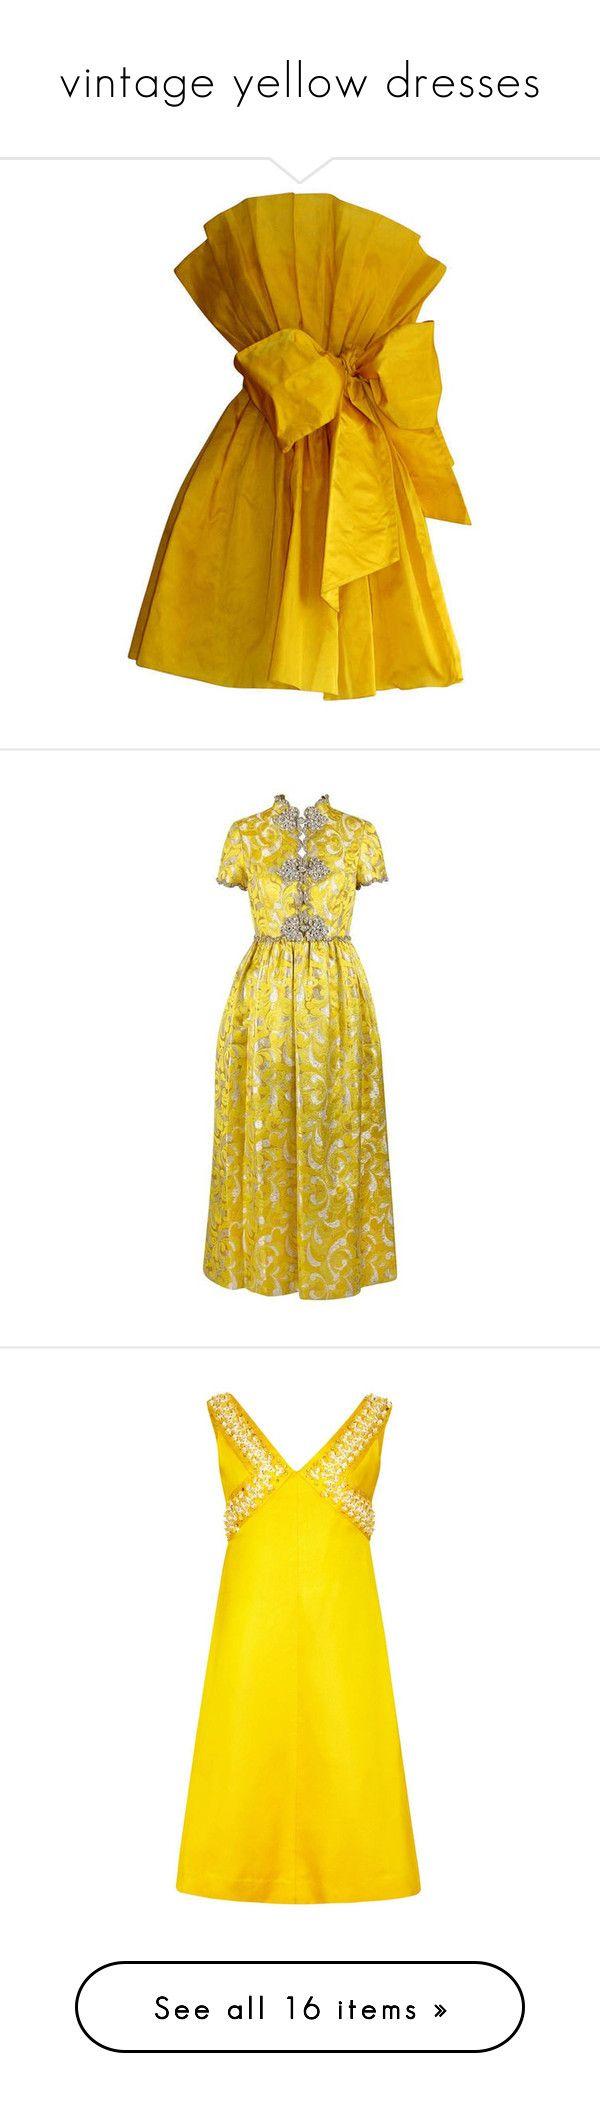 Vintage yellow dresses